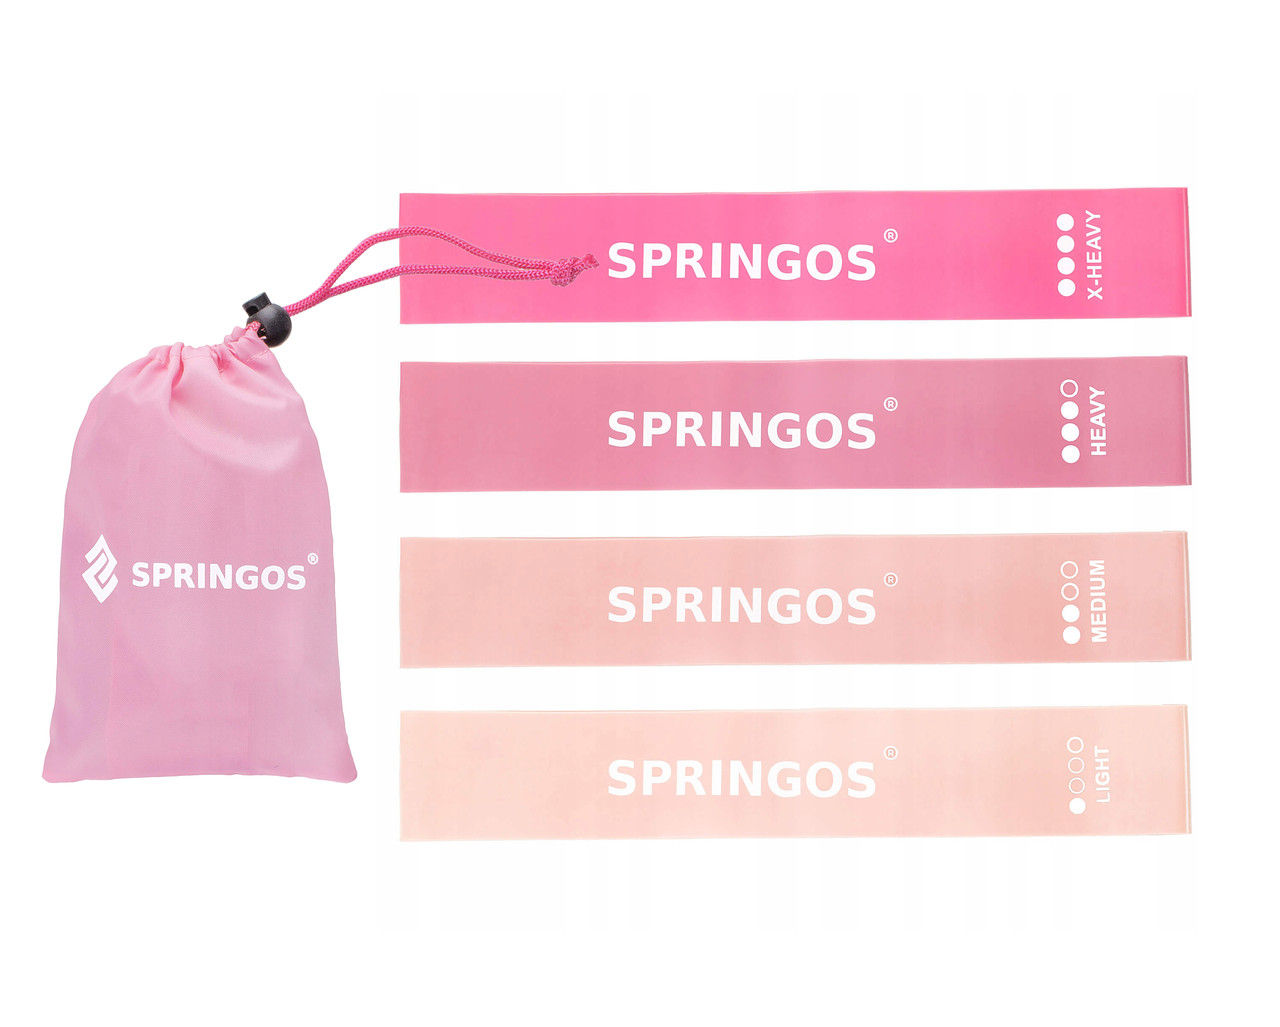 Гумка для фітнесу і спорту (стрічка-еспандер) Springos Mini Power Band 4 шт 0-20 кг PB0019